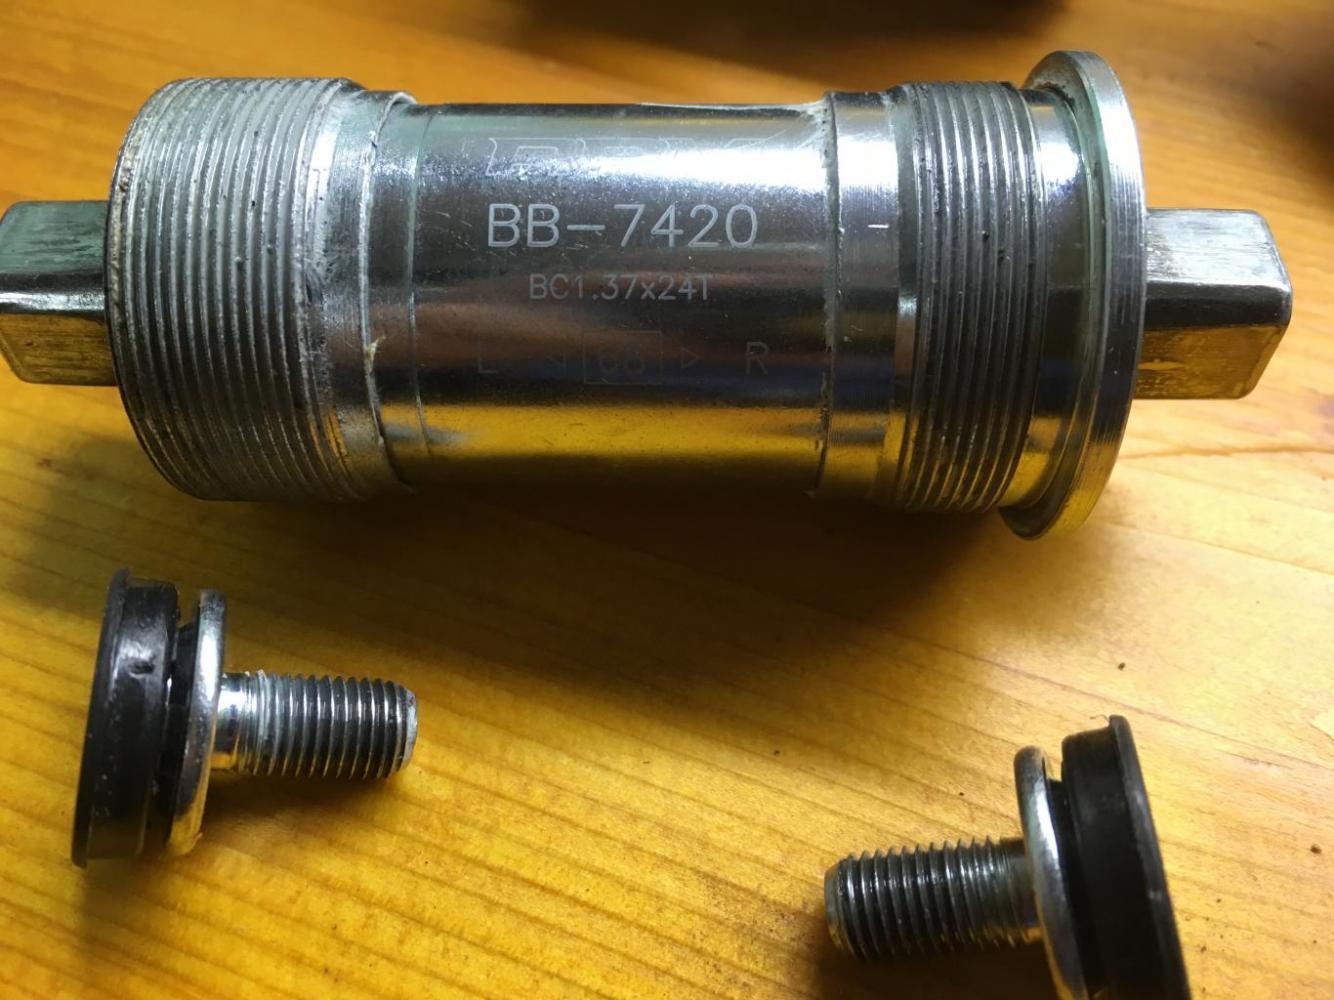 BFAFBA51-B7E8-46C2-8D87-91FD331C130C.jpeg